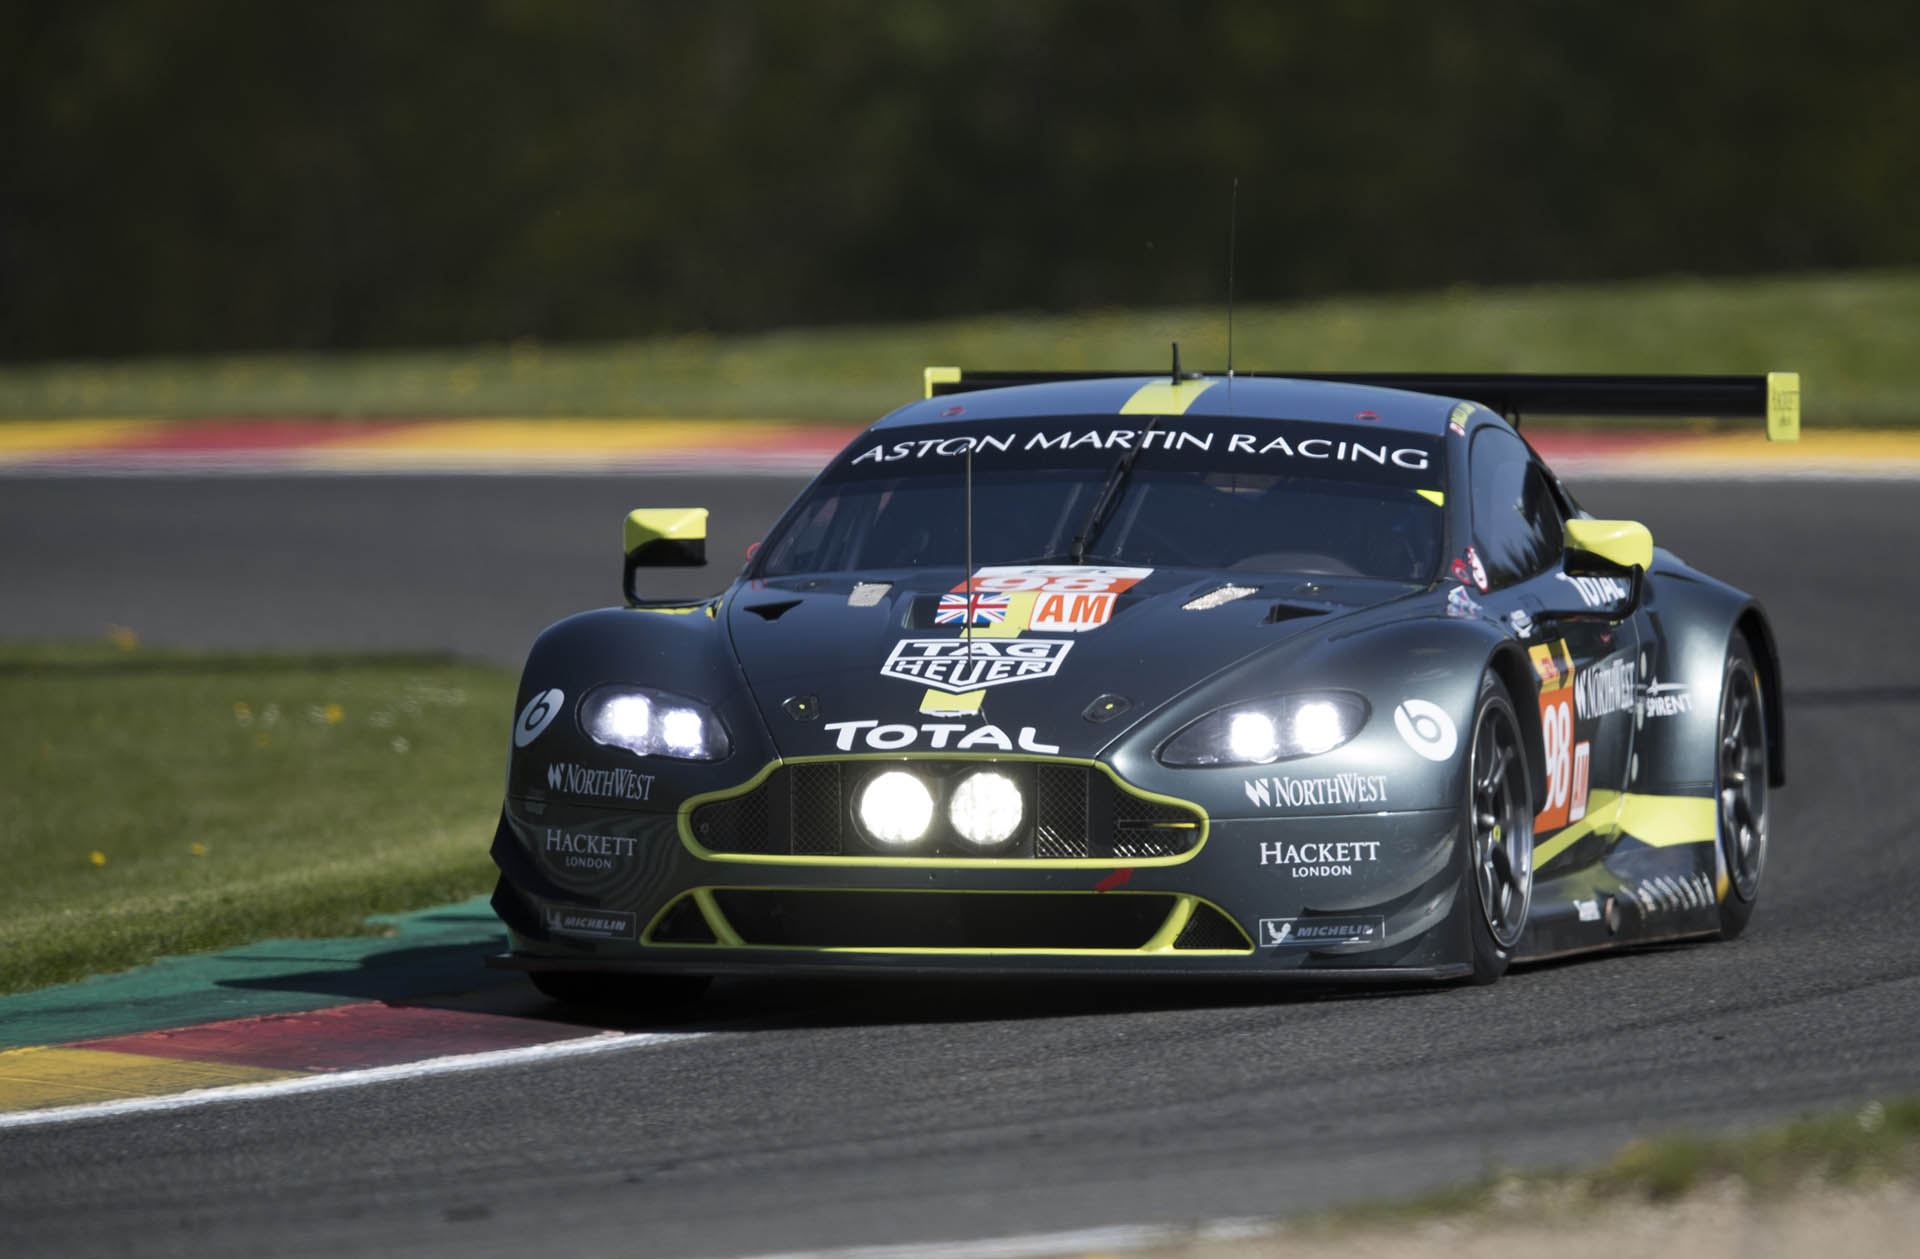 Aston Martin Vantage GTE im TAG-Heuer-Outfit